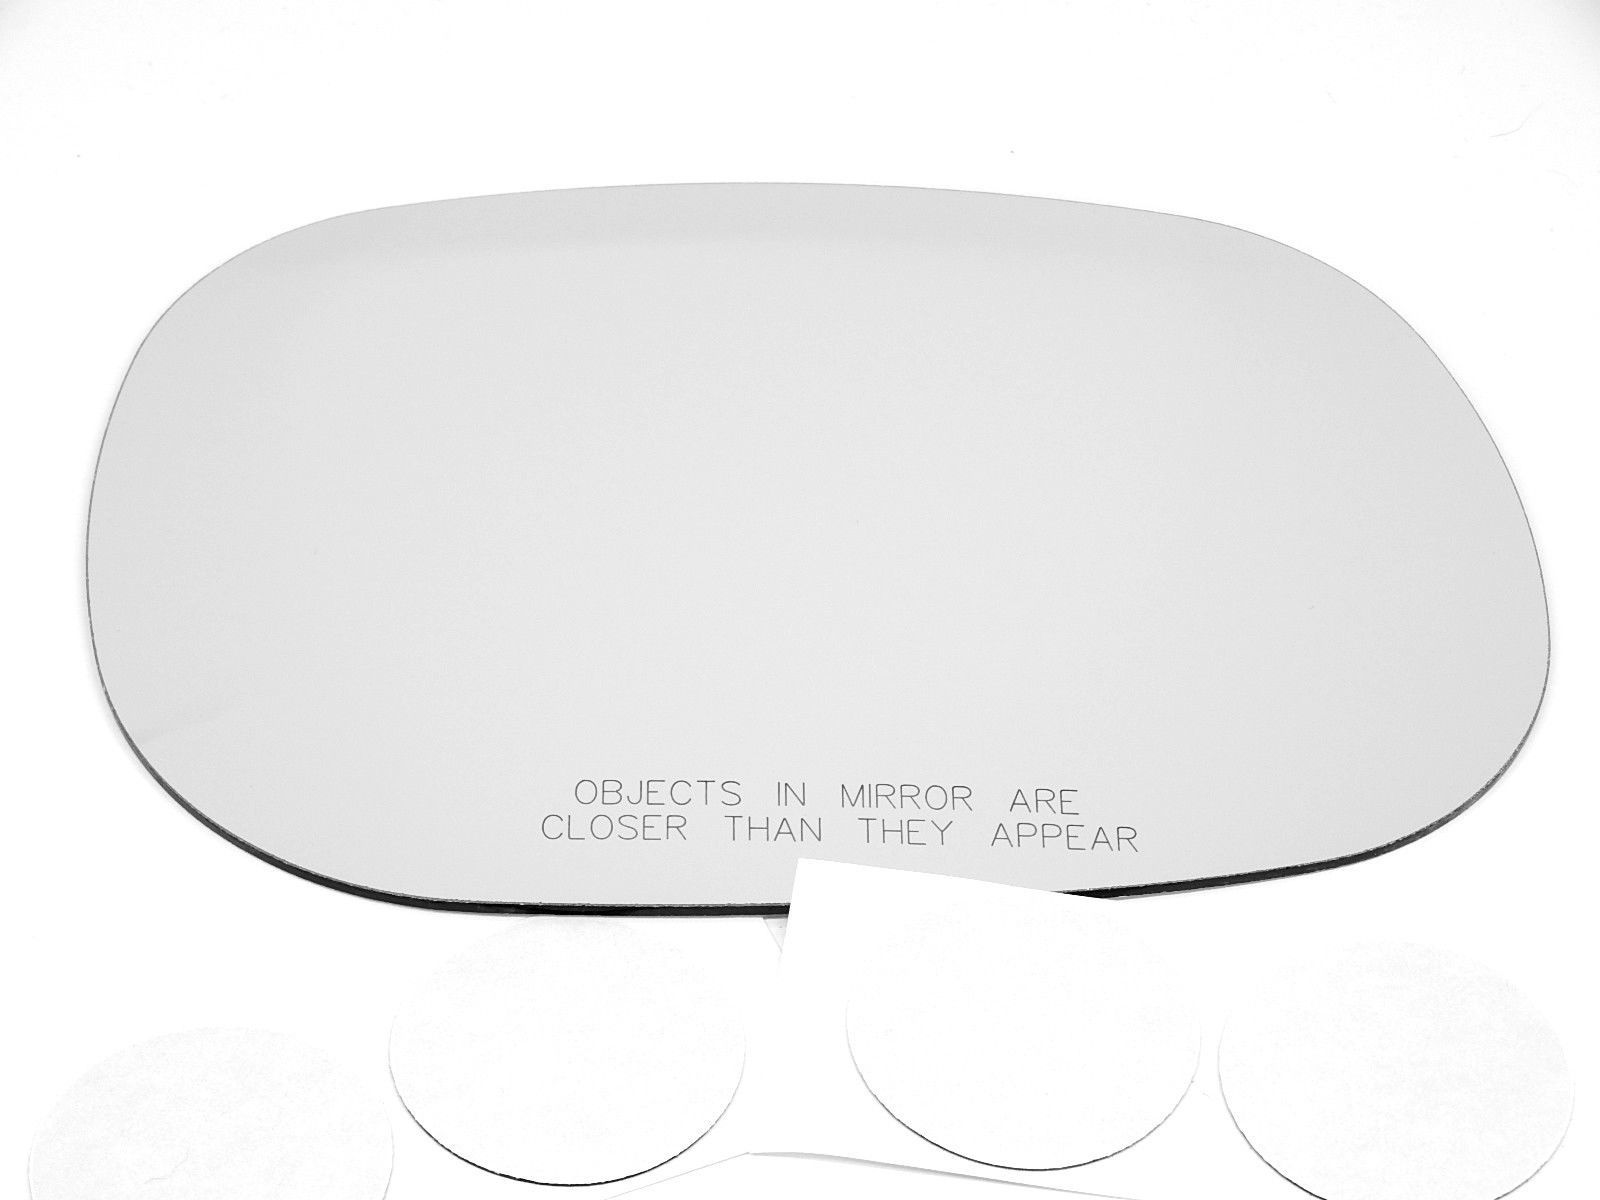 Fits Dakota Durango Ram P/u Van Right Pass Heated Mirror Glass Lens w/Folding